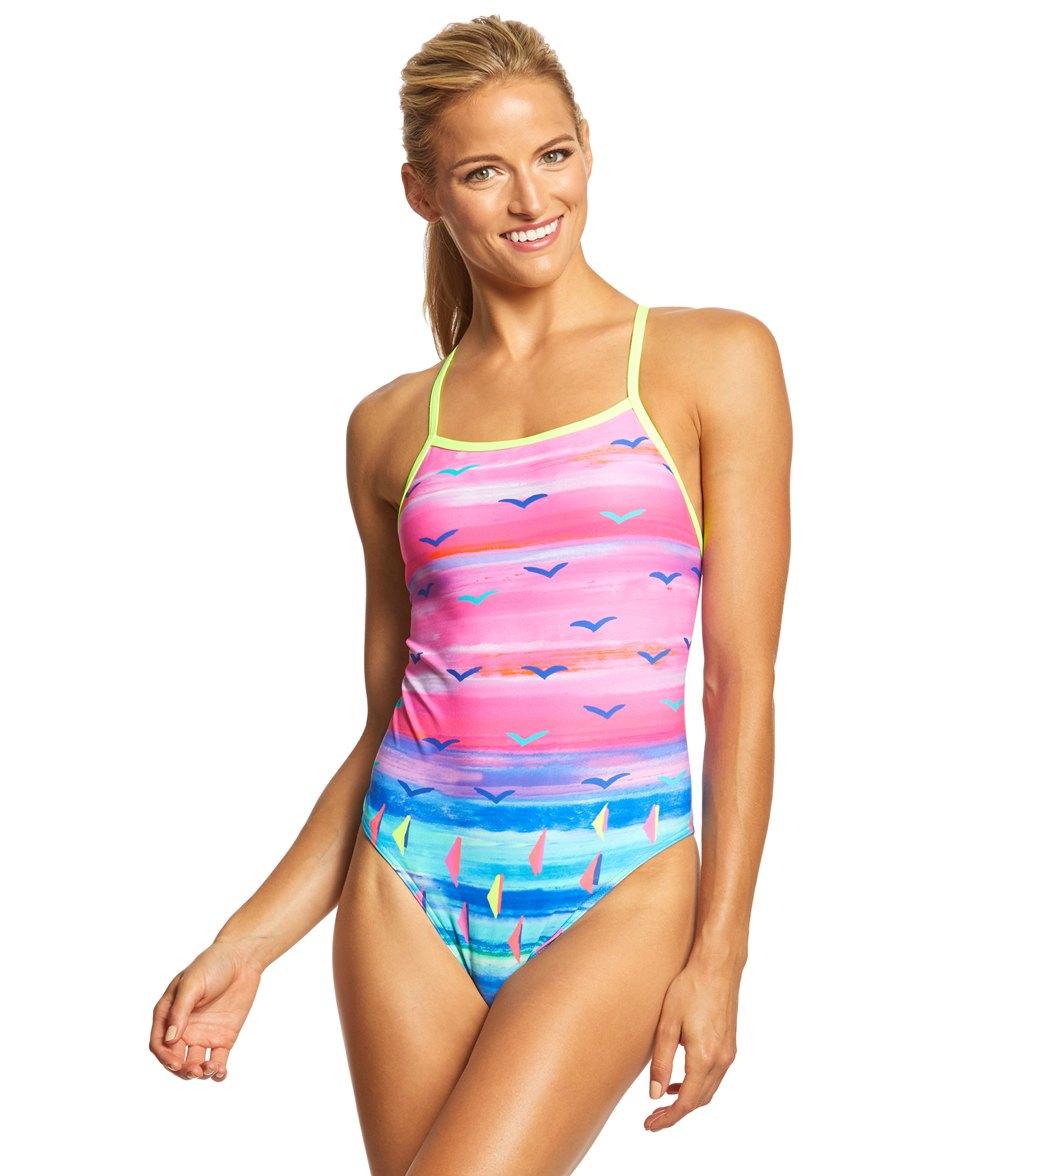 2b2d946f5587a Funkita womens regatta royale tie me tight one piece swimsuit at free  shipping jpg 1044x1176 Tight